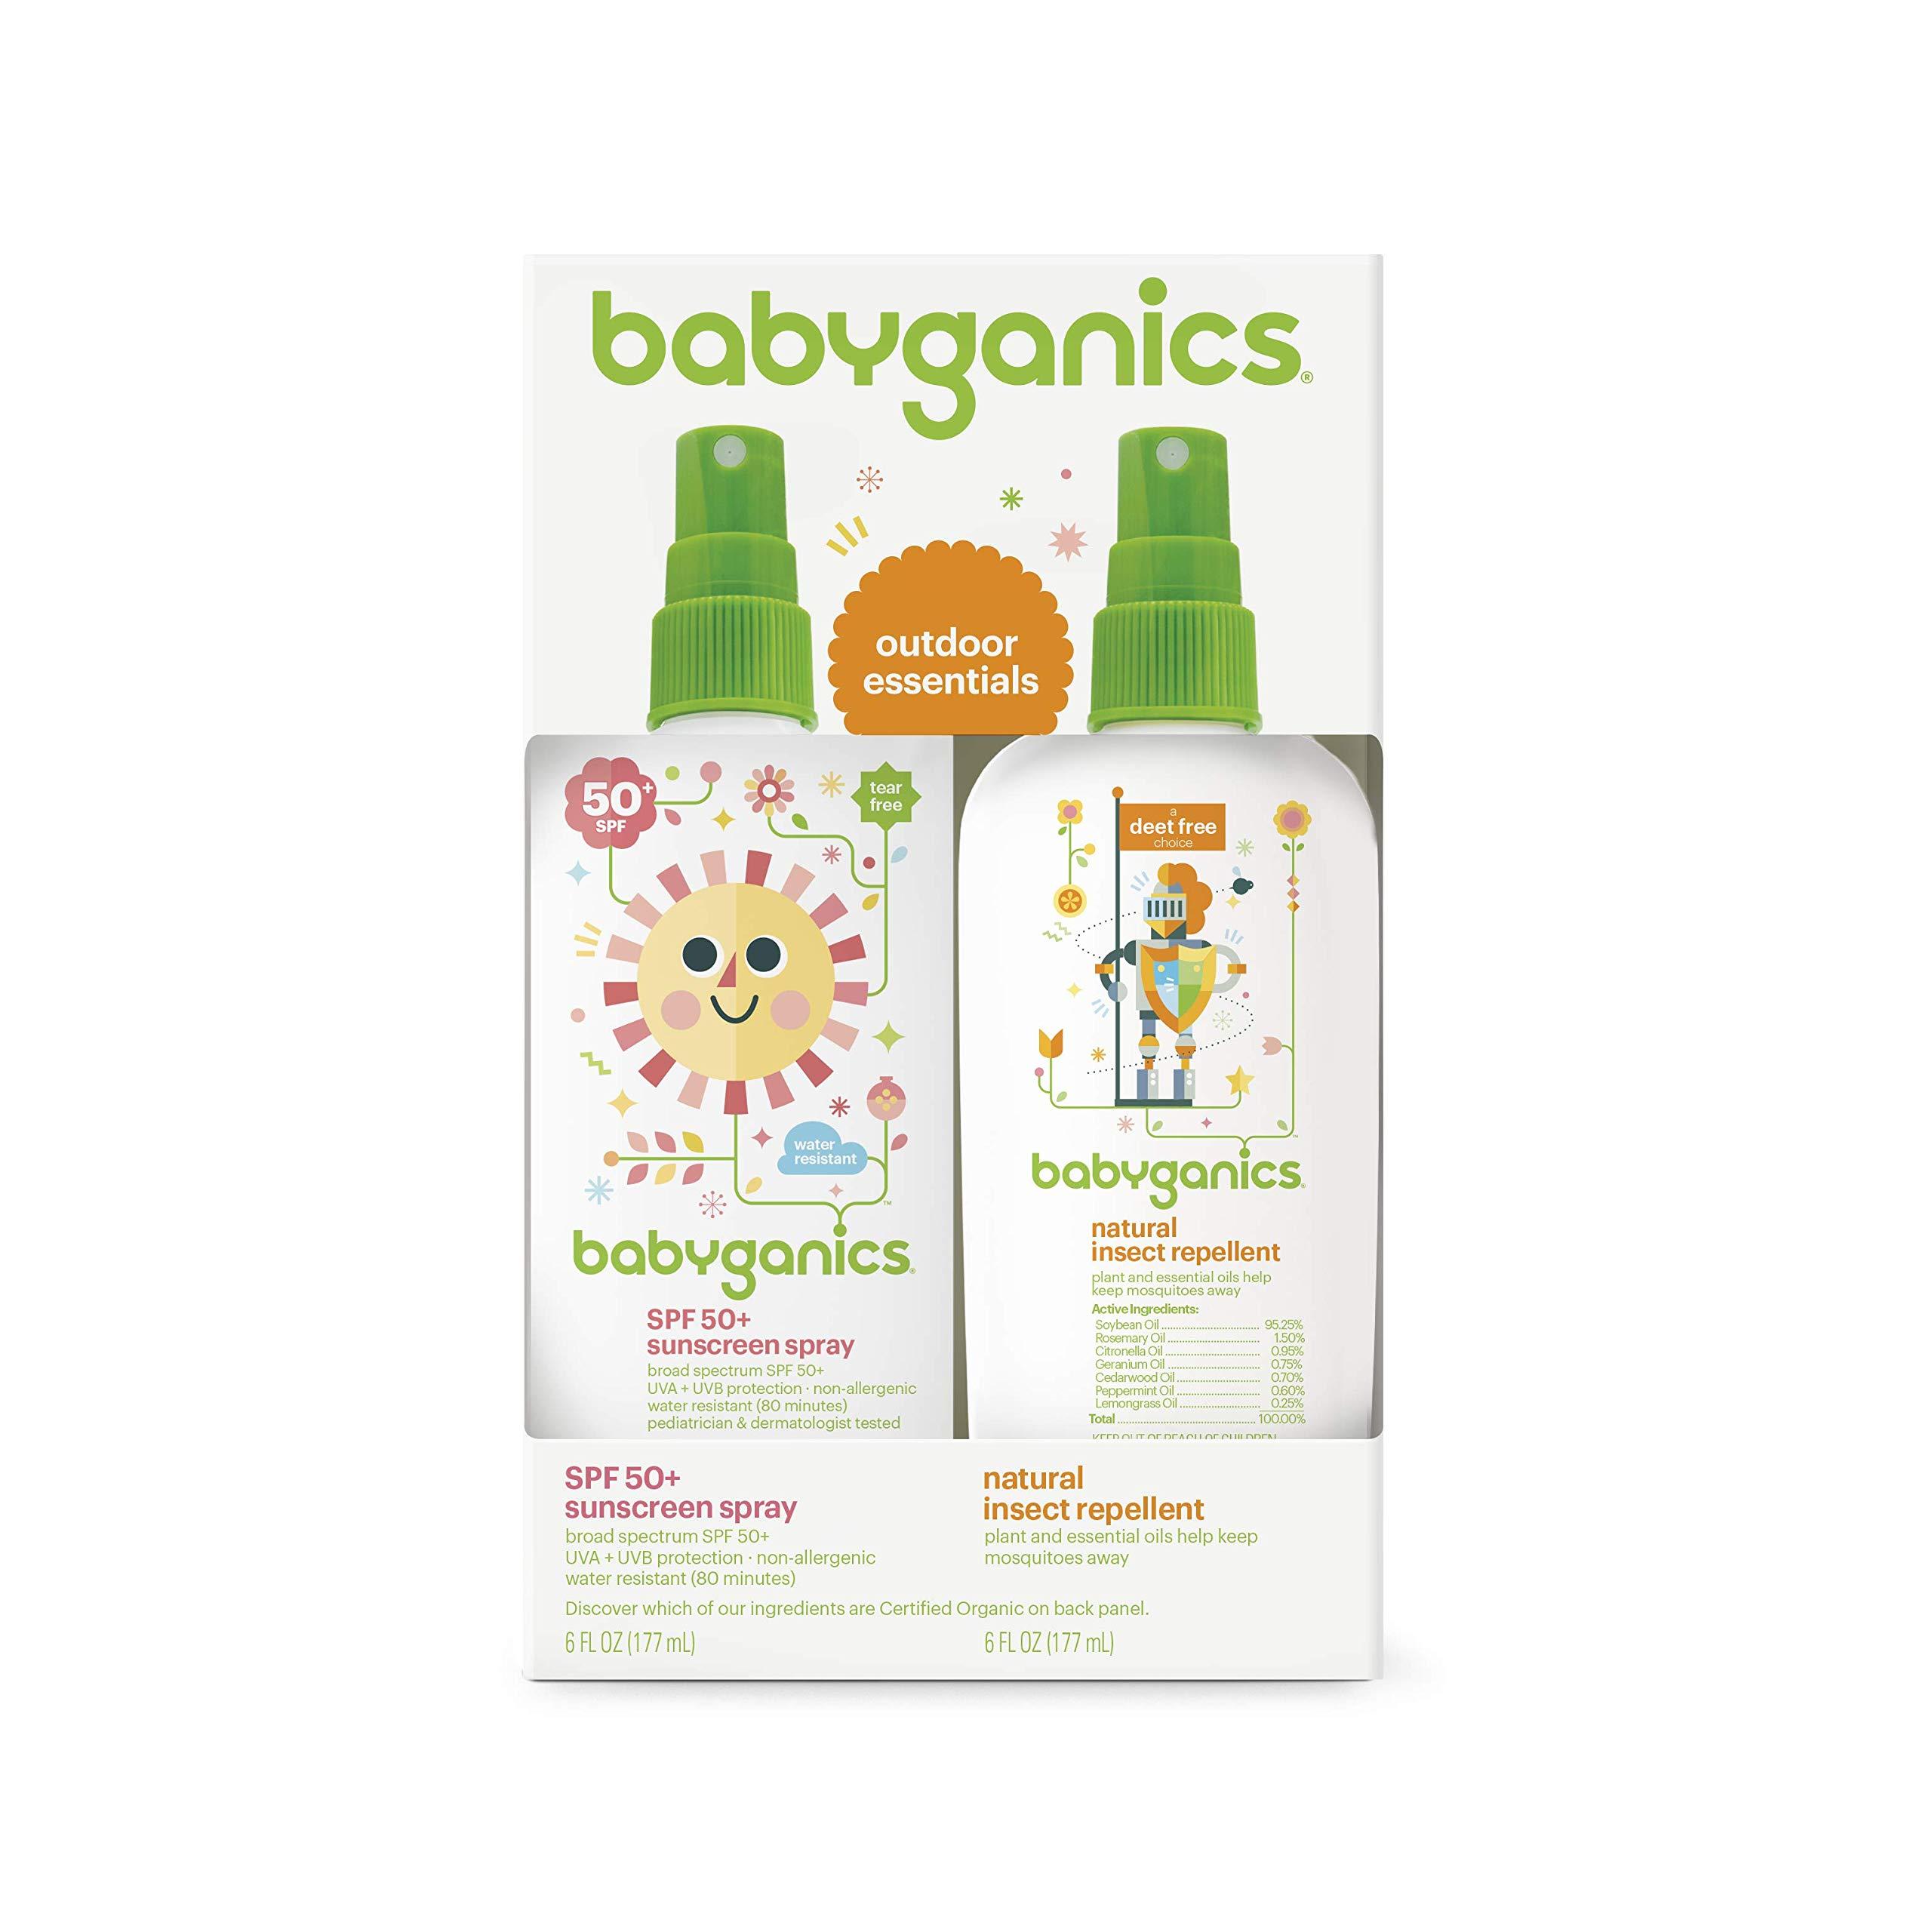 Babyganics Baby Sunscreen Spray SPF 50, 6oz Spray Bottle + Natural Bug Spray 6oz Spray Bottle Combo Pack by Babyganics